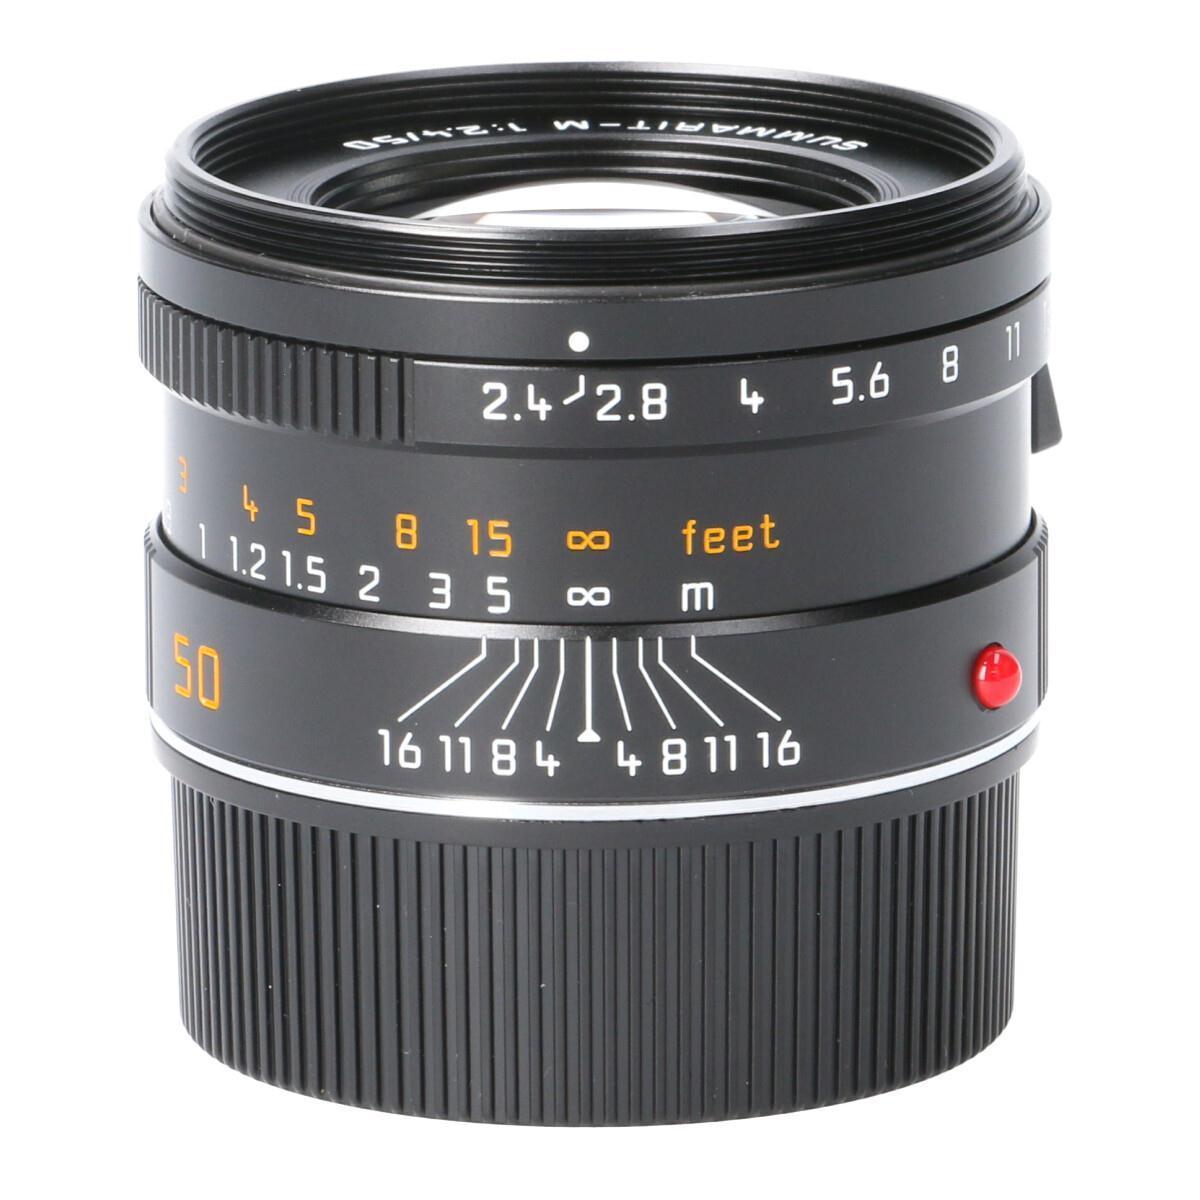 LEICA SUMMARIT M50mm F2.4 6BIT【中古】